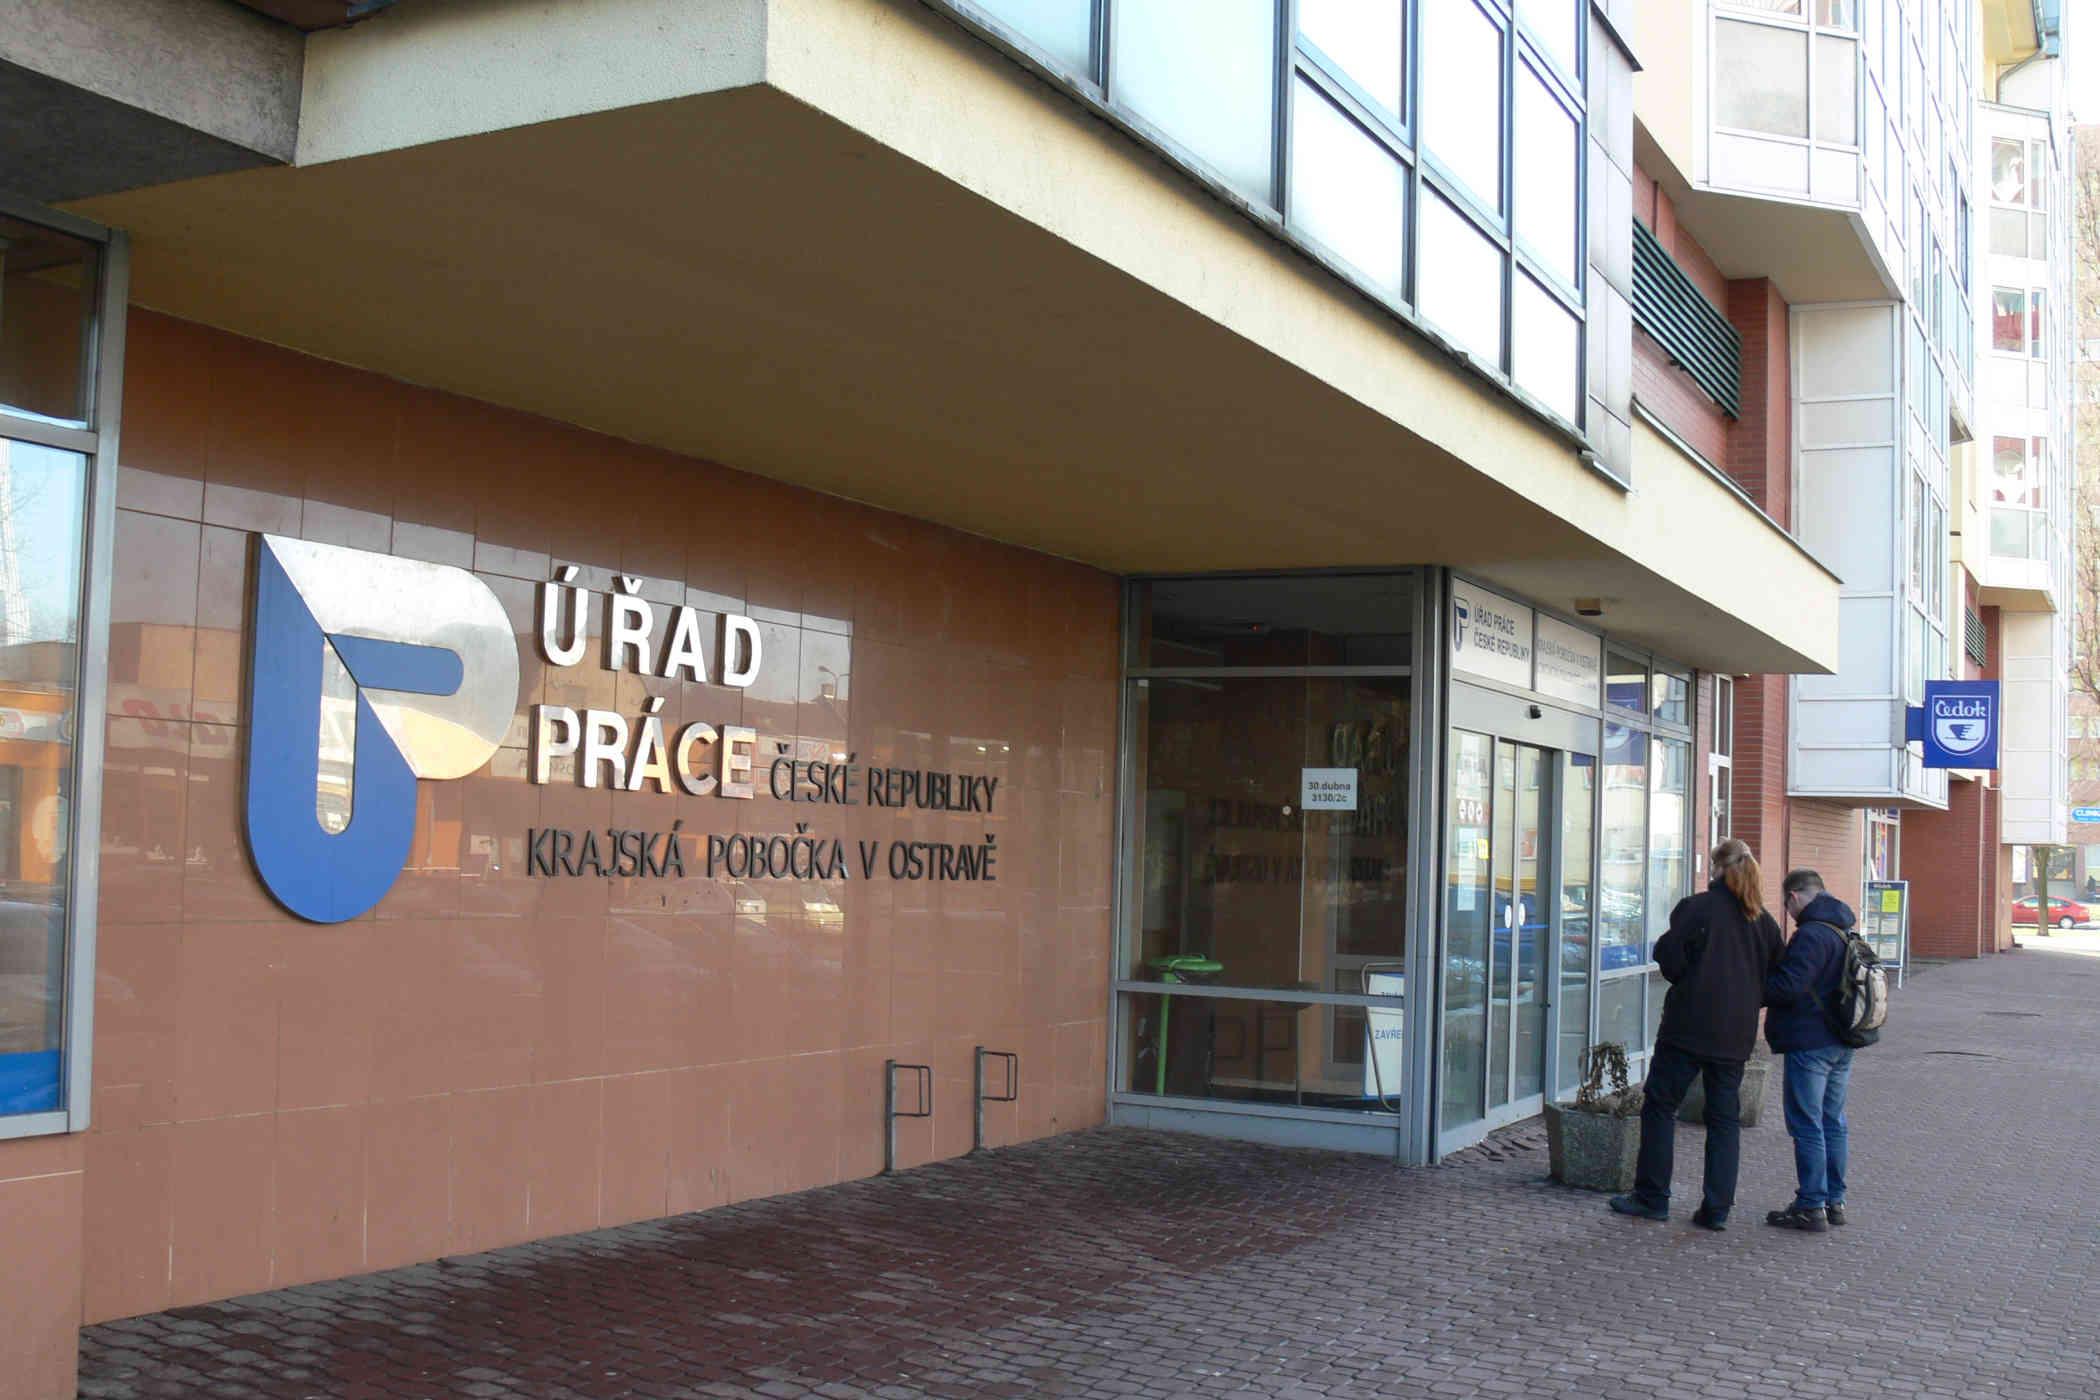 Малачова: Безработица в Чехии упала до 4,2 процента в марте